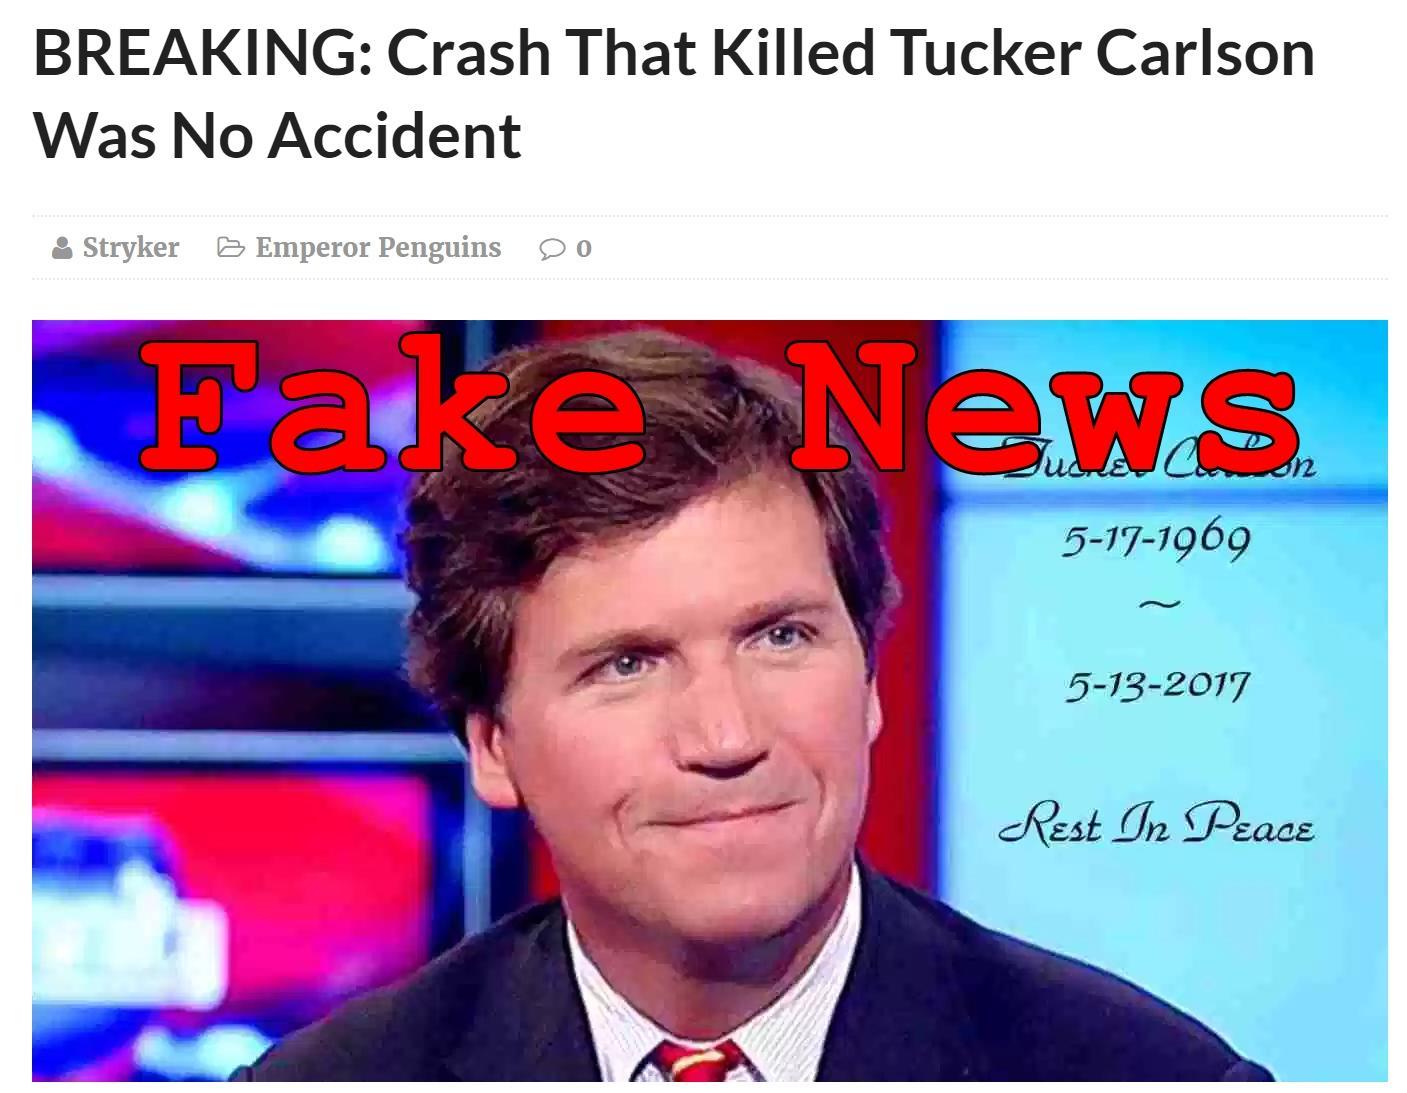 Fake News: There Was NO Crash That Killed Tucker Carlson